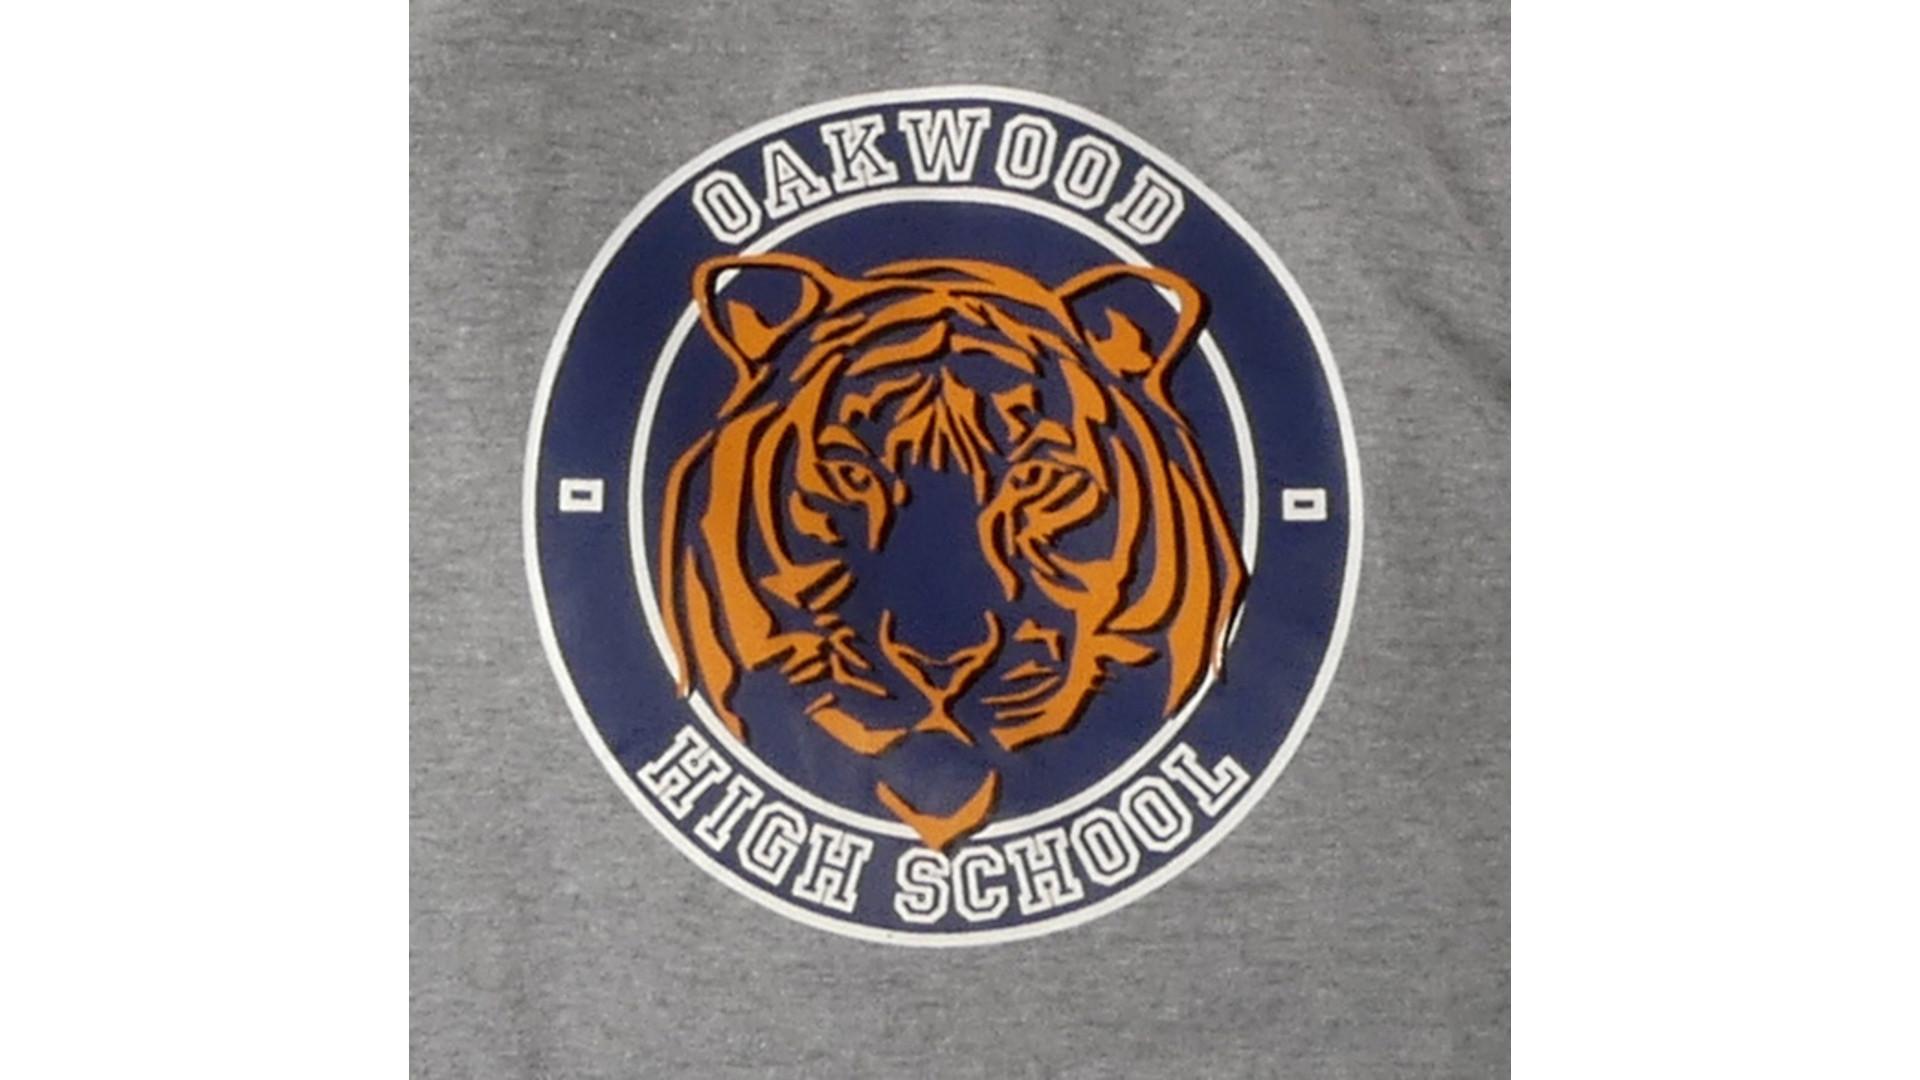 Oakwood States 63615 Oak